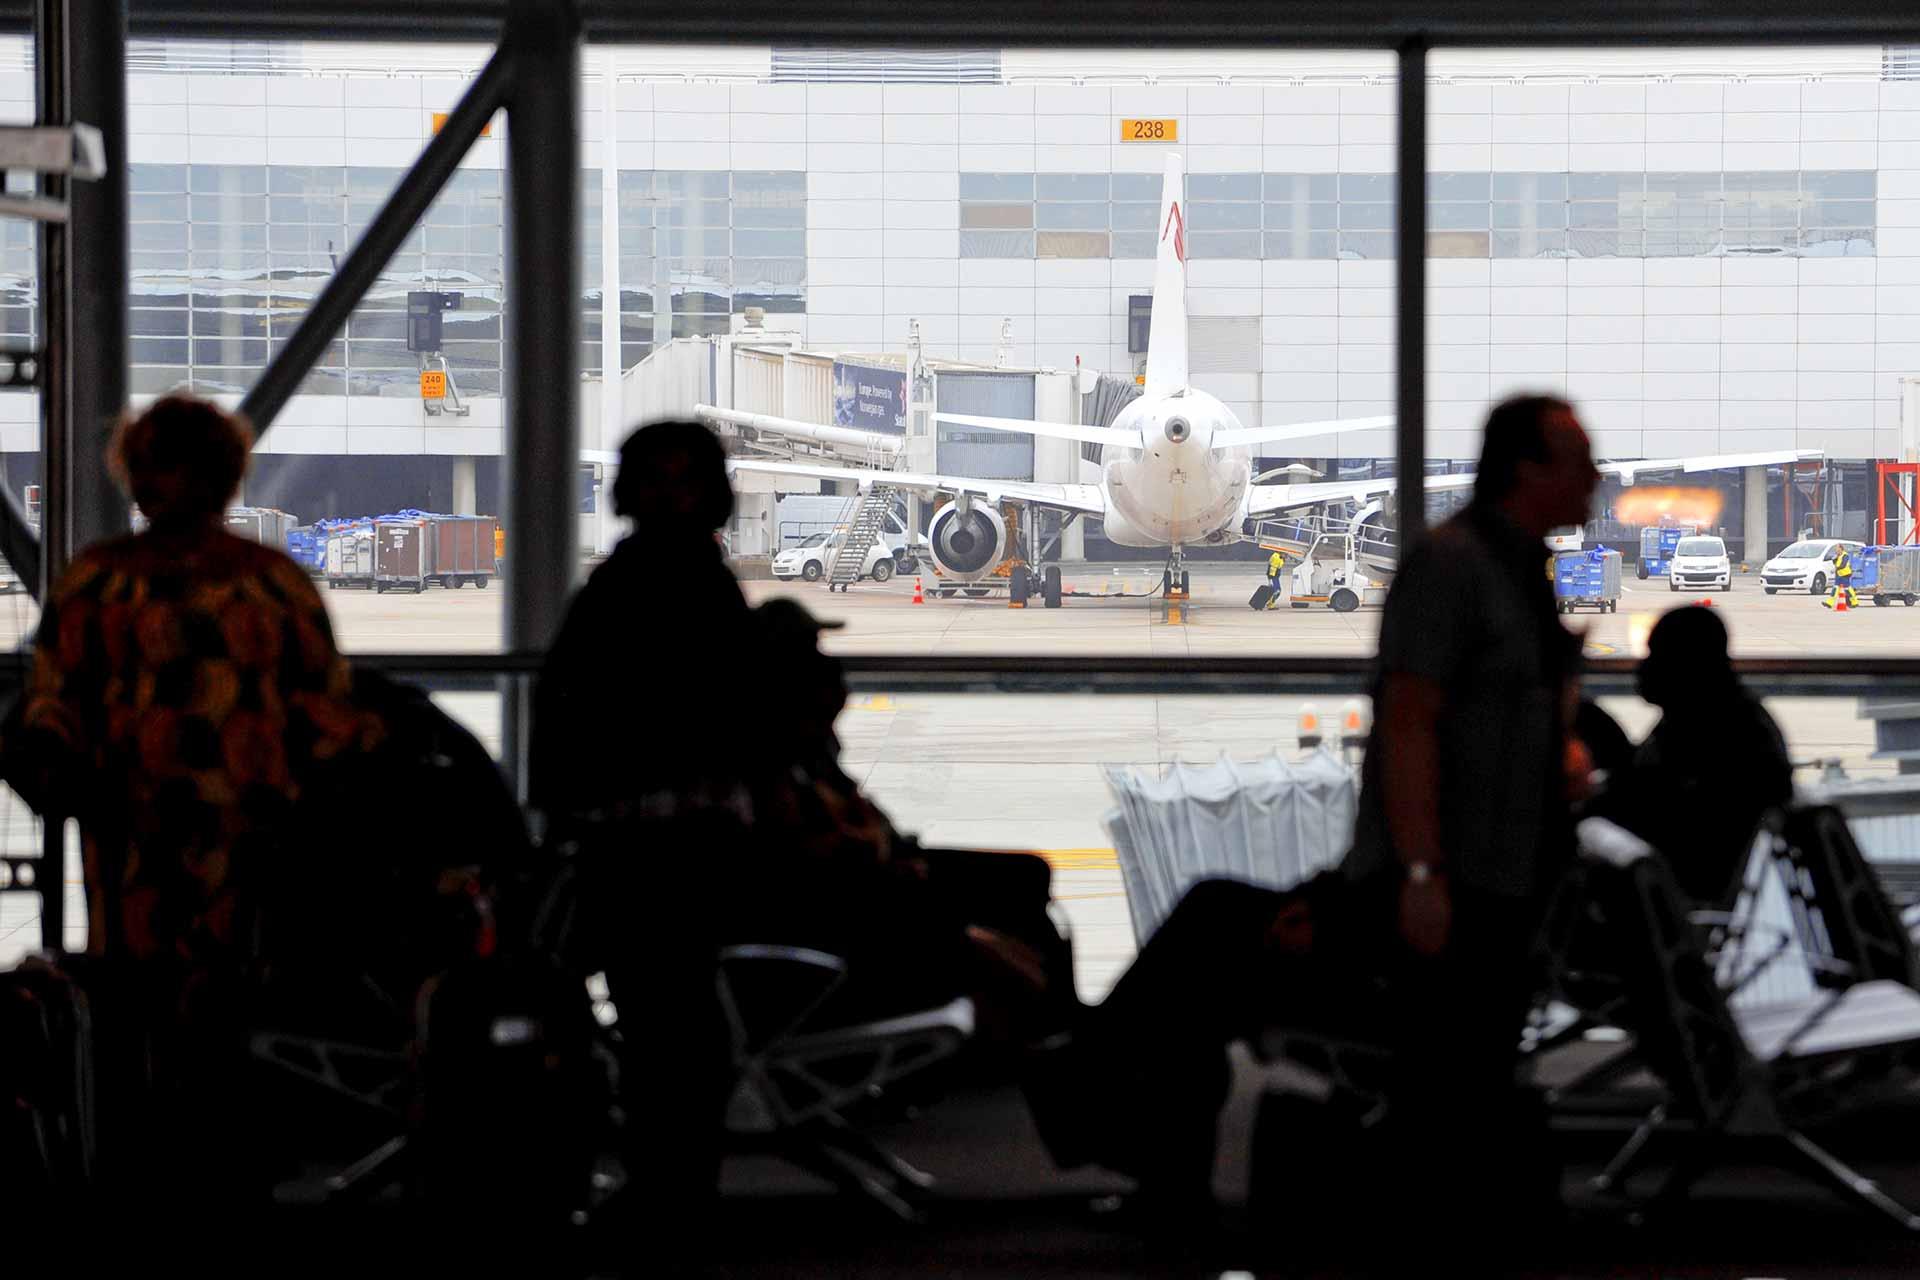 Zaventem airport passengers